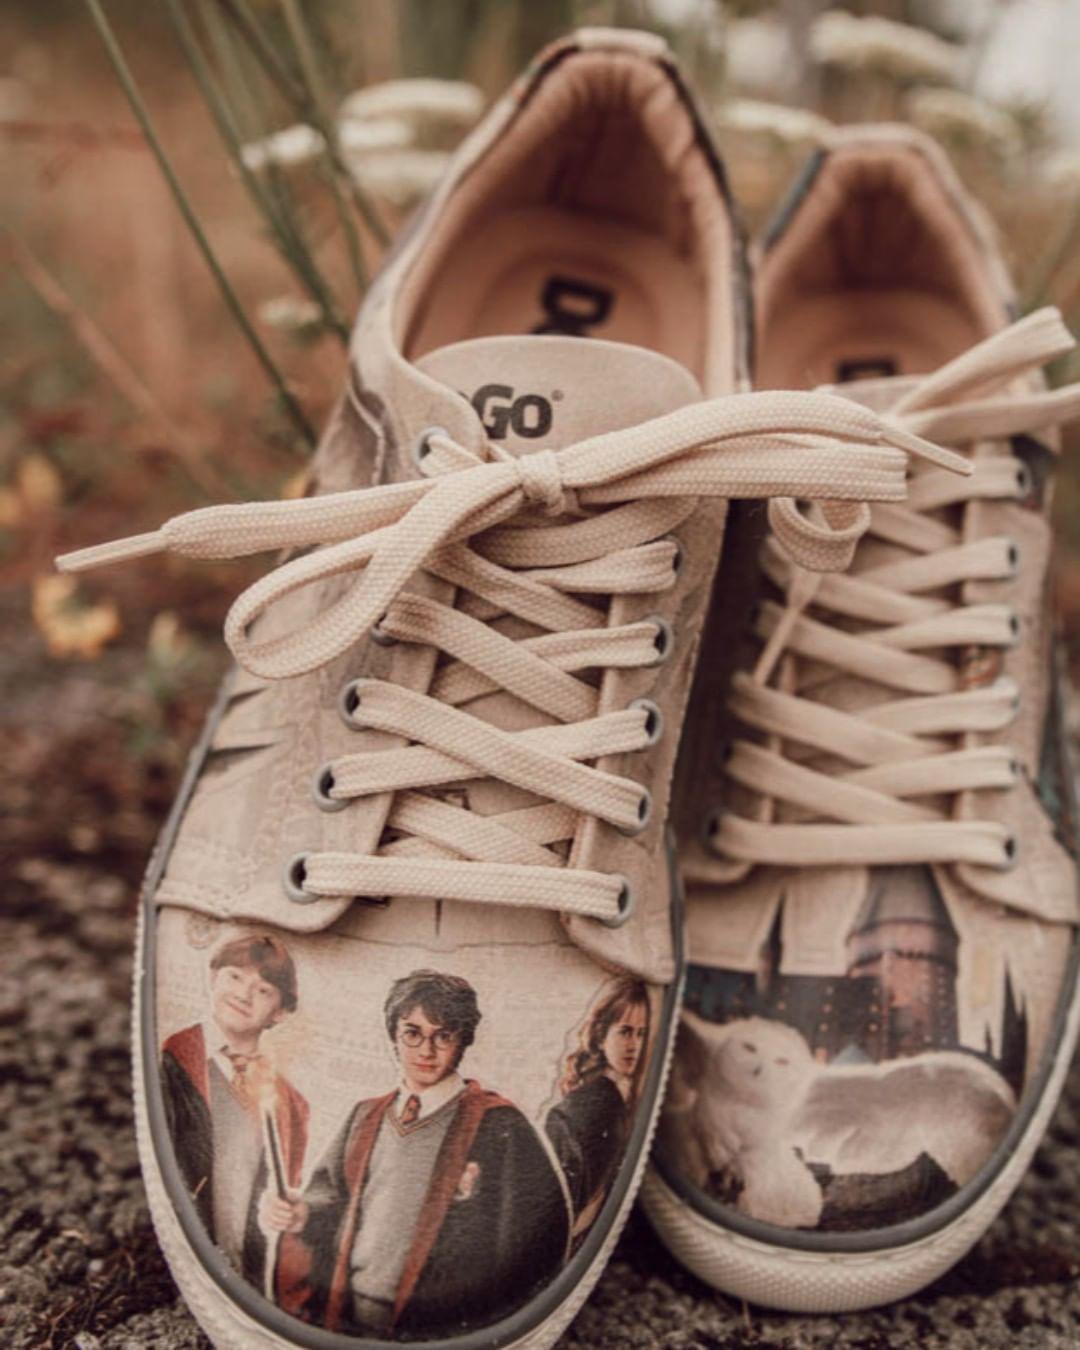 Vegane Schuhe Mit Harry Pottermotiv Von Dogo Shoes Fair